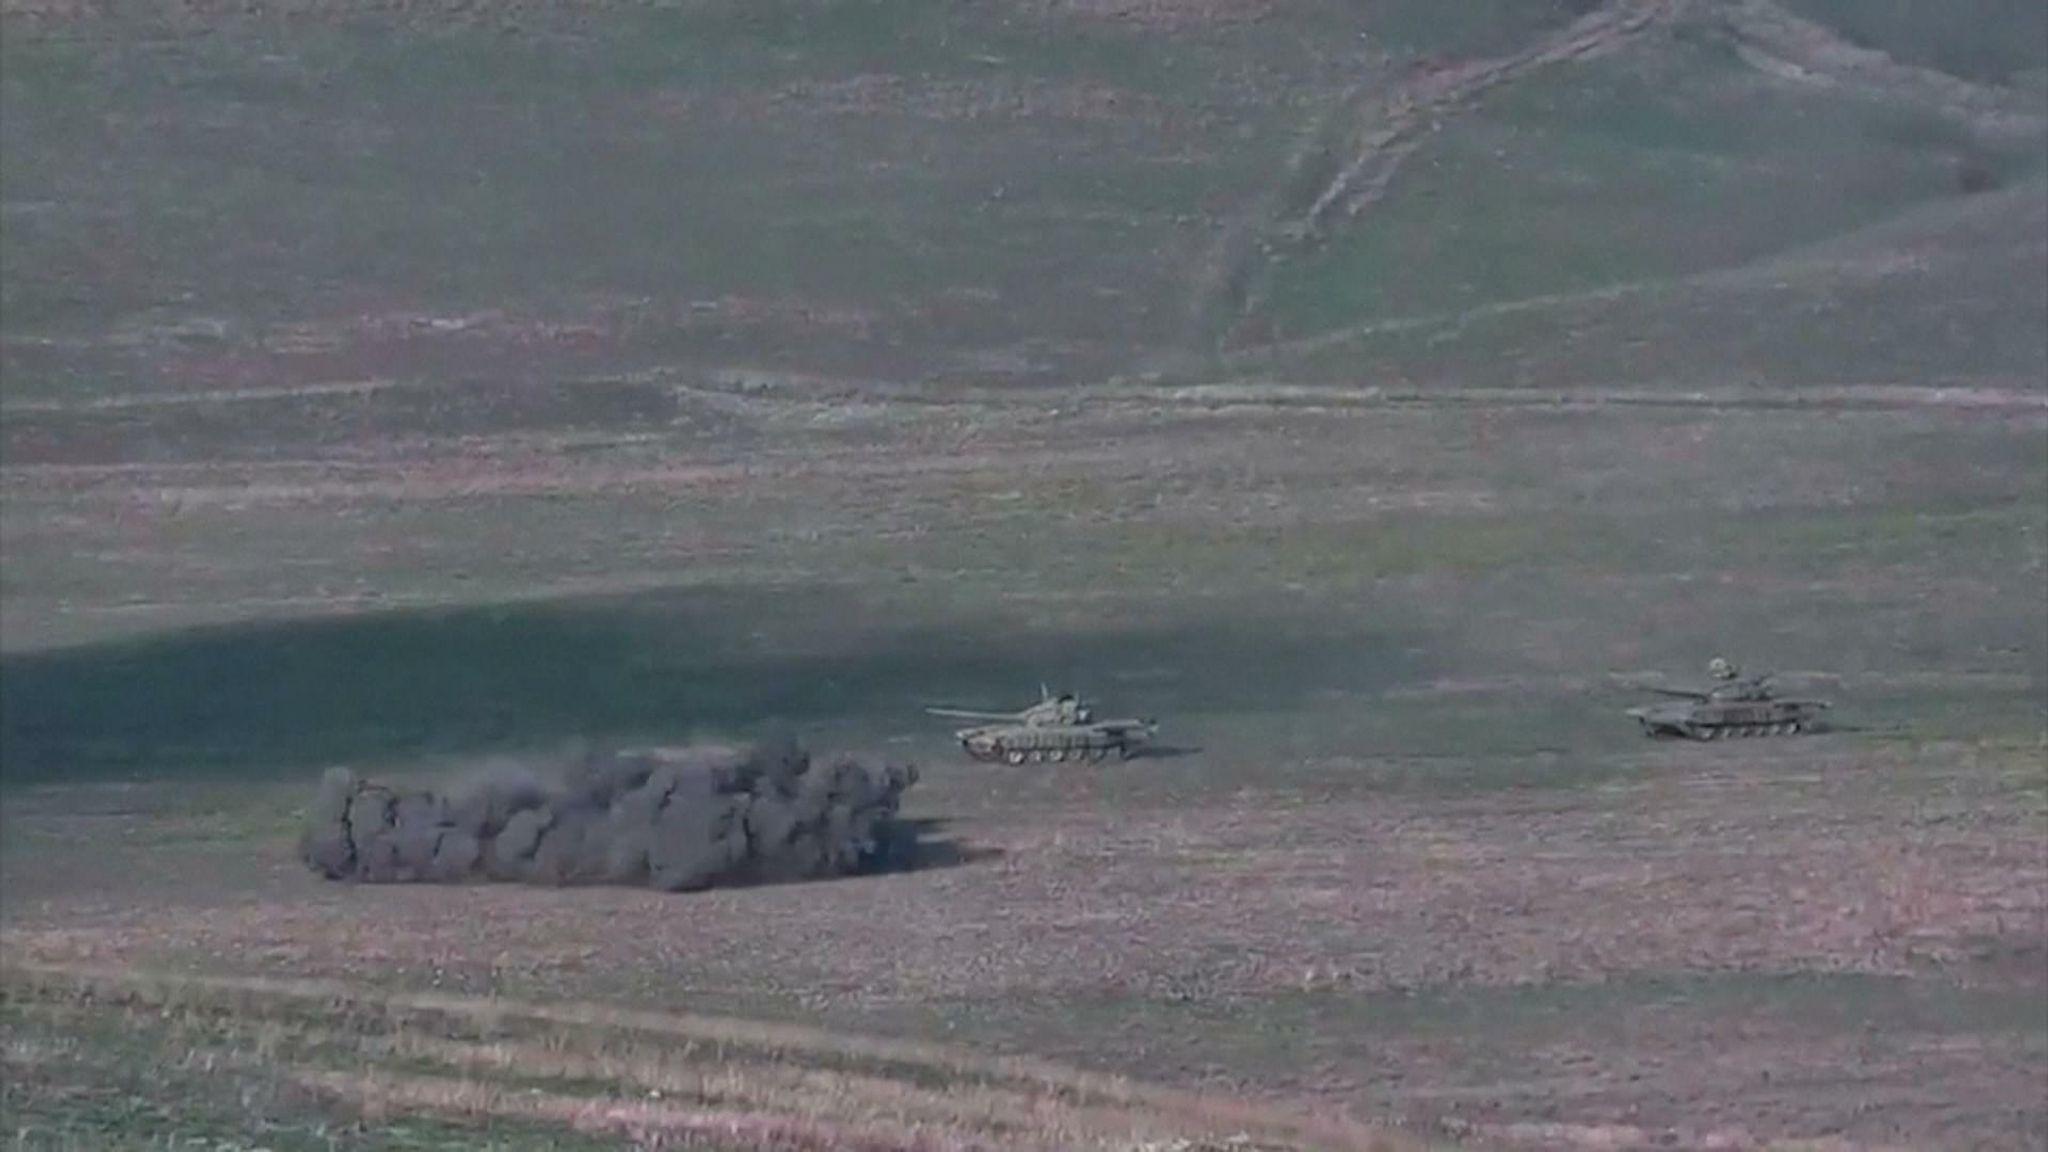 Azerbaijani tanks destroyed, says Armenia | World News | Sky News